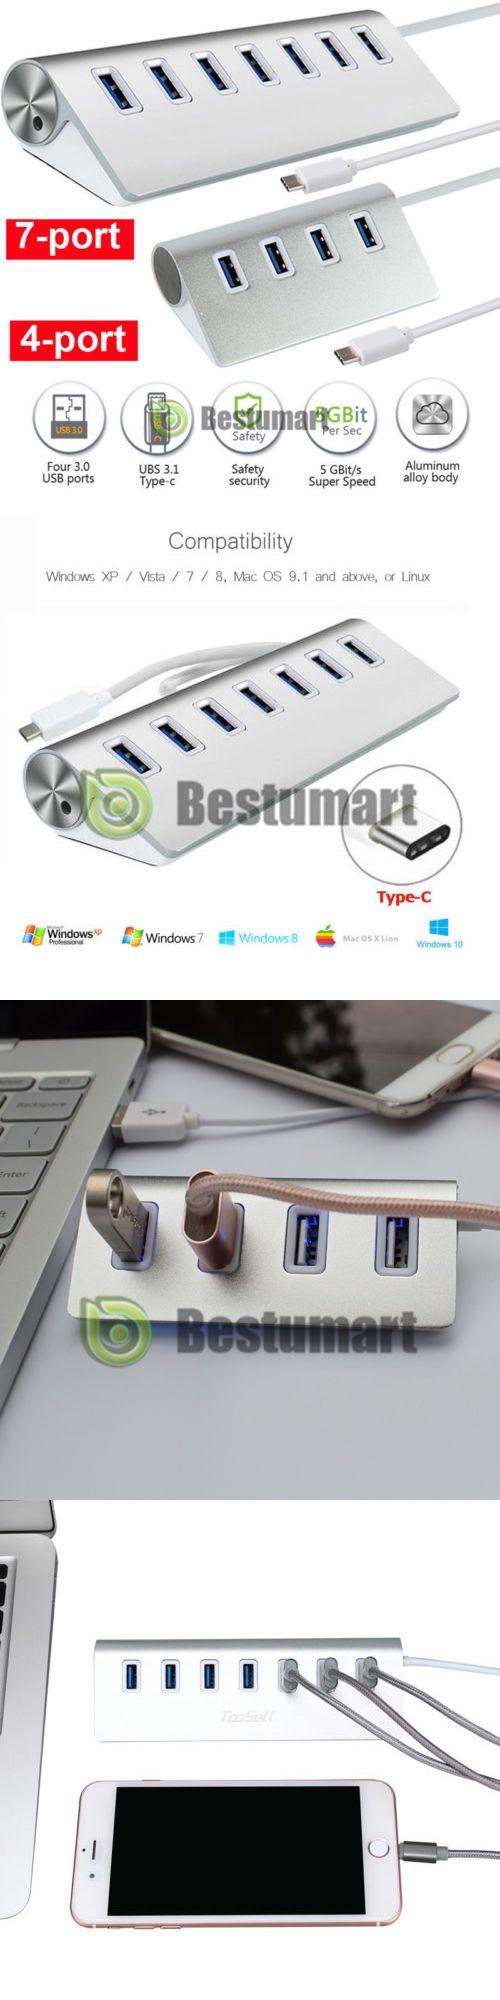 USB 3.1 TypeC to 4//7-port USB 3.0 Aluminum Hub Multi-Function For Macs PC Laptop